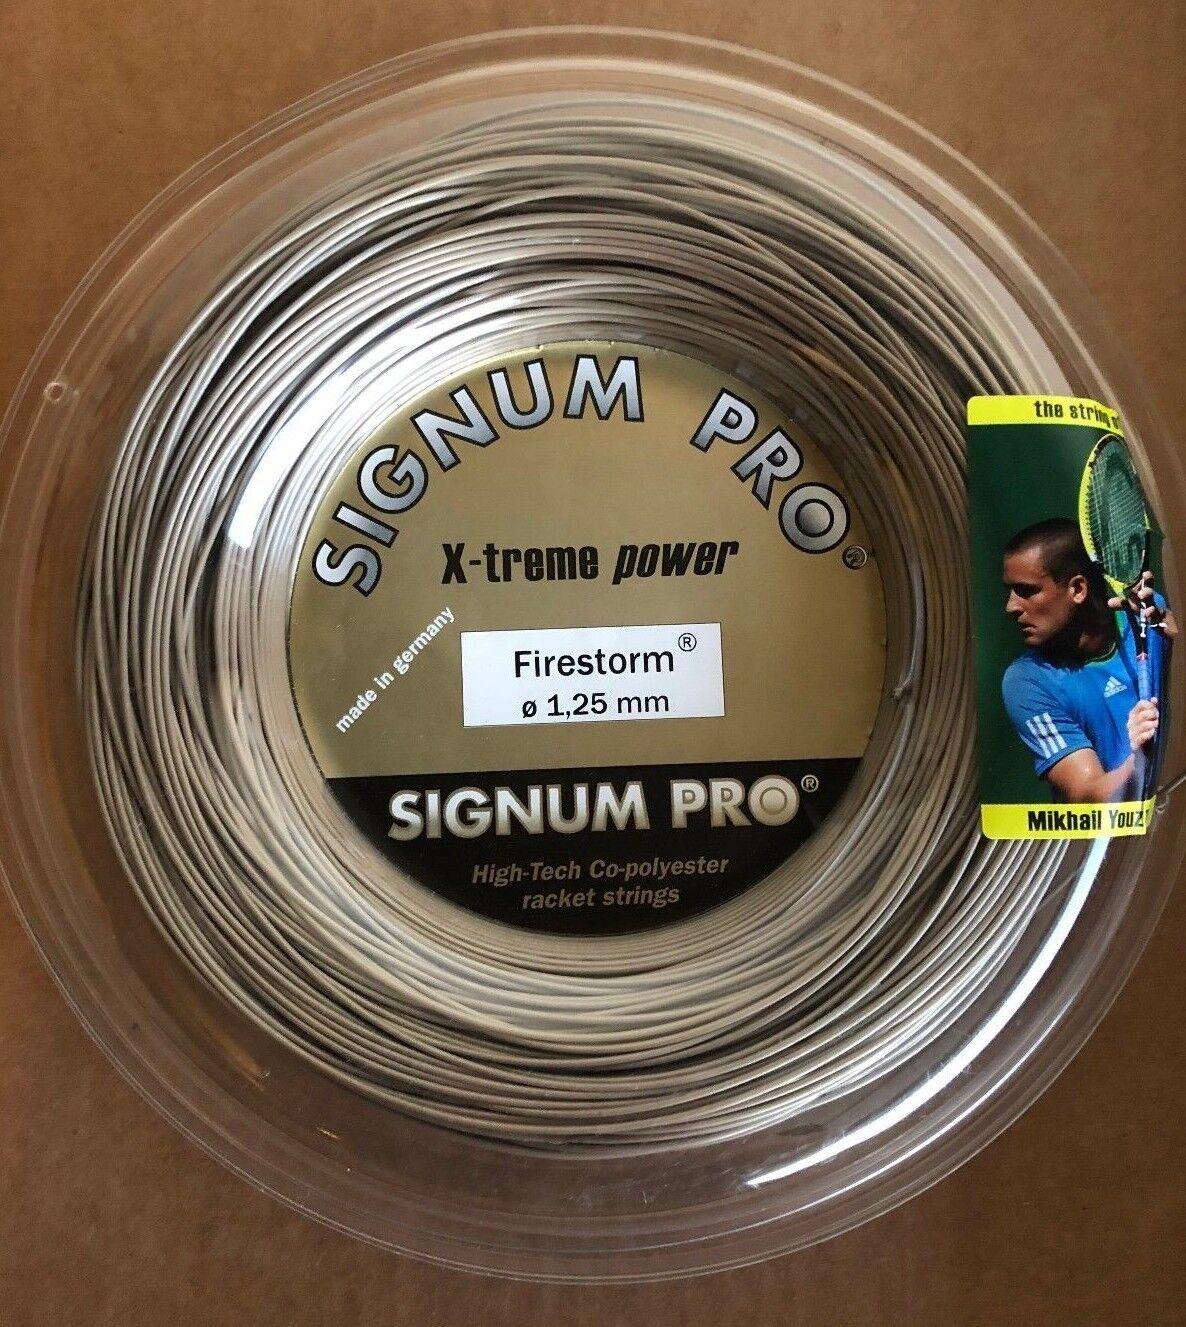 Signum Pro Firestorm 1.25mm (660ft) - Premium Co-Poly Tennis string